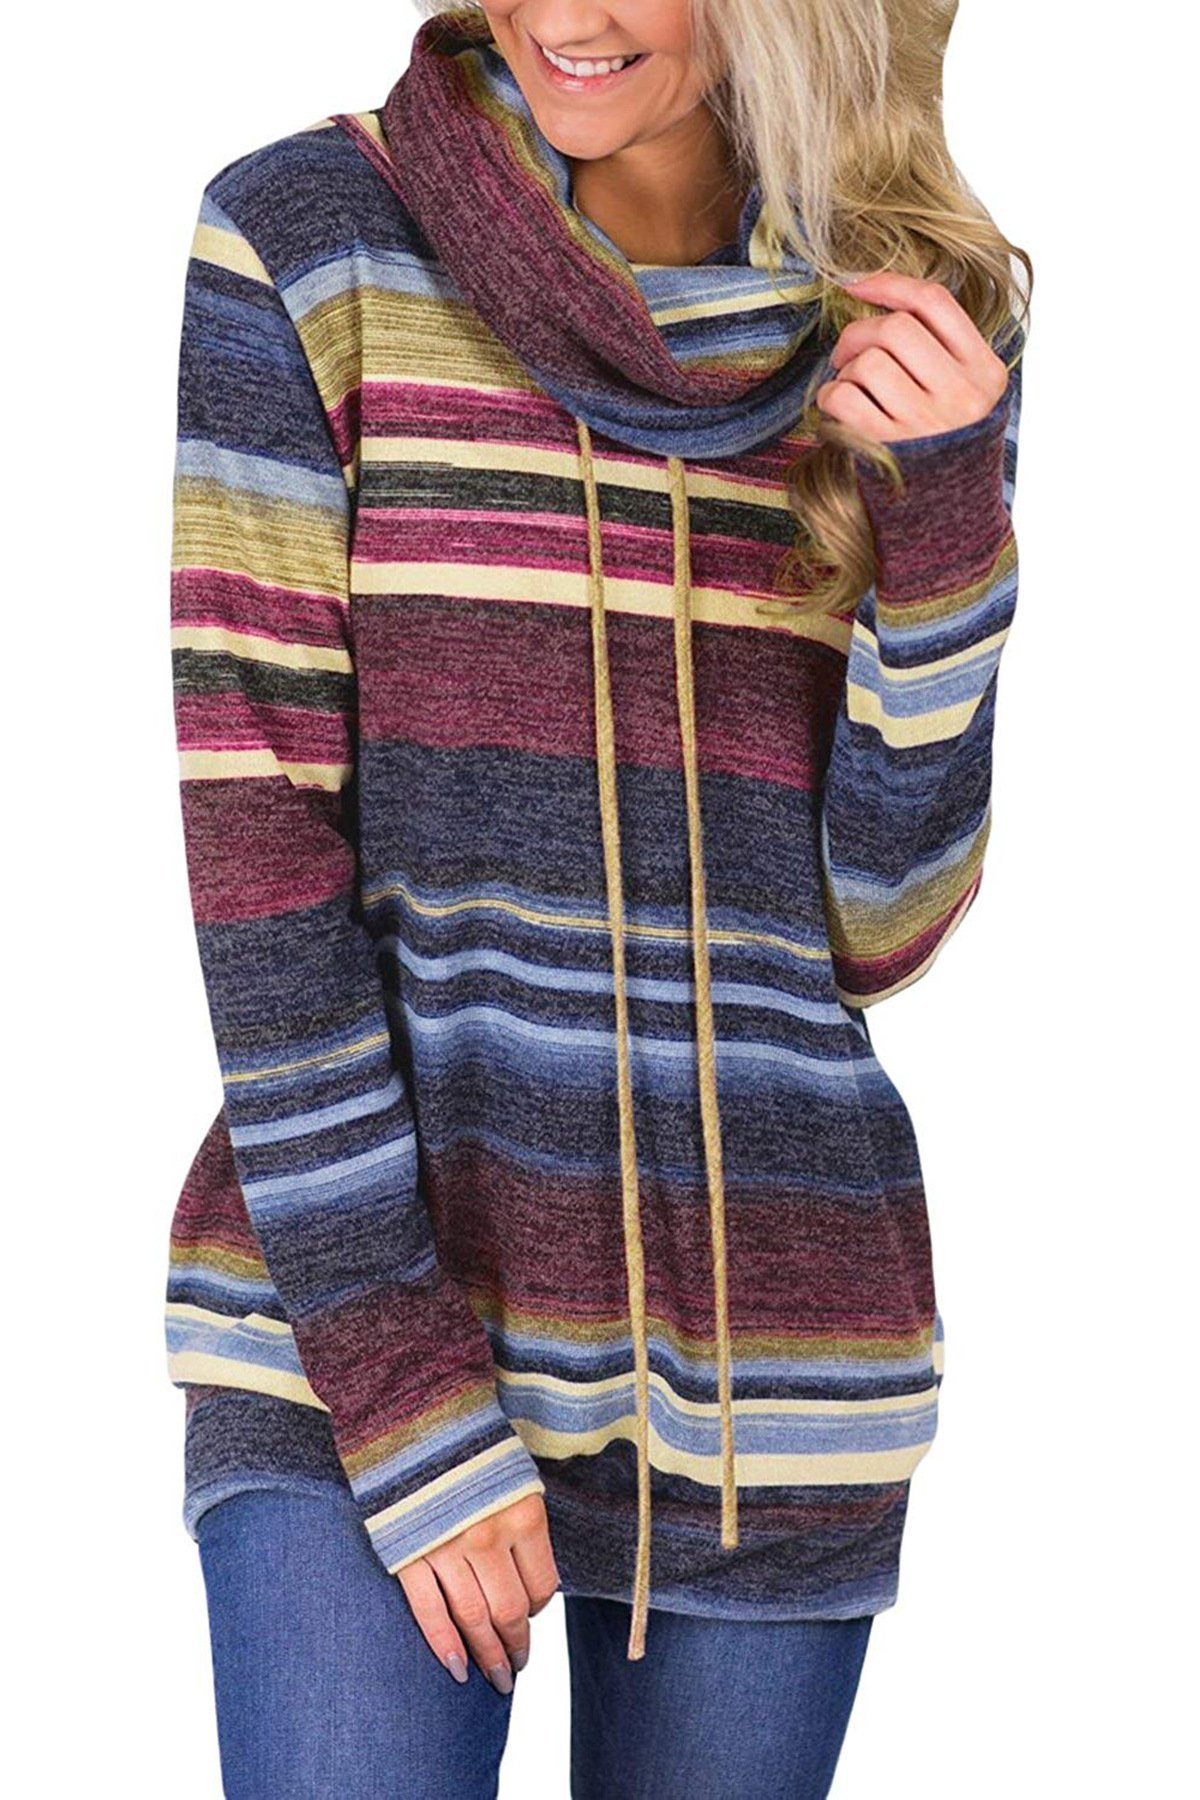 MBQMBSS Womens Sweatshirt Cowl Neck Long Sleeve Striped Pocket Drawstring Pullover Top Sweatshirt (L, Blue)